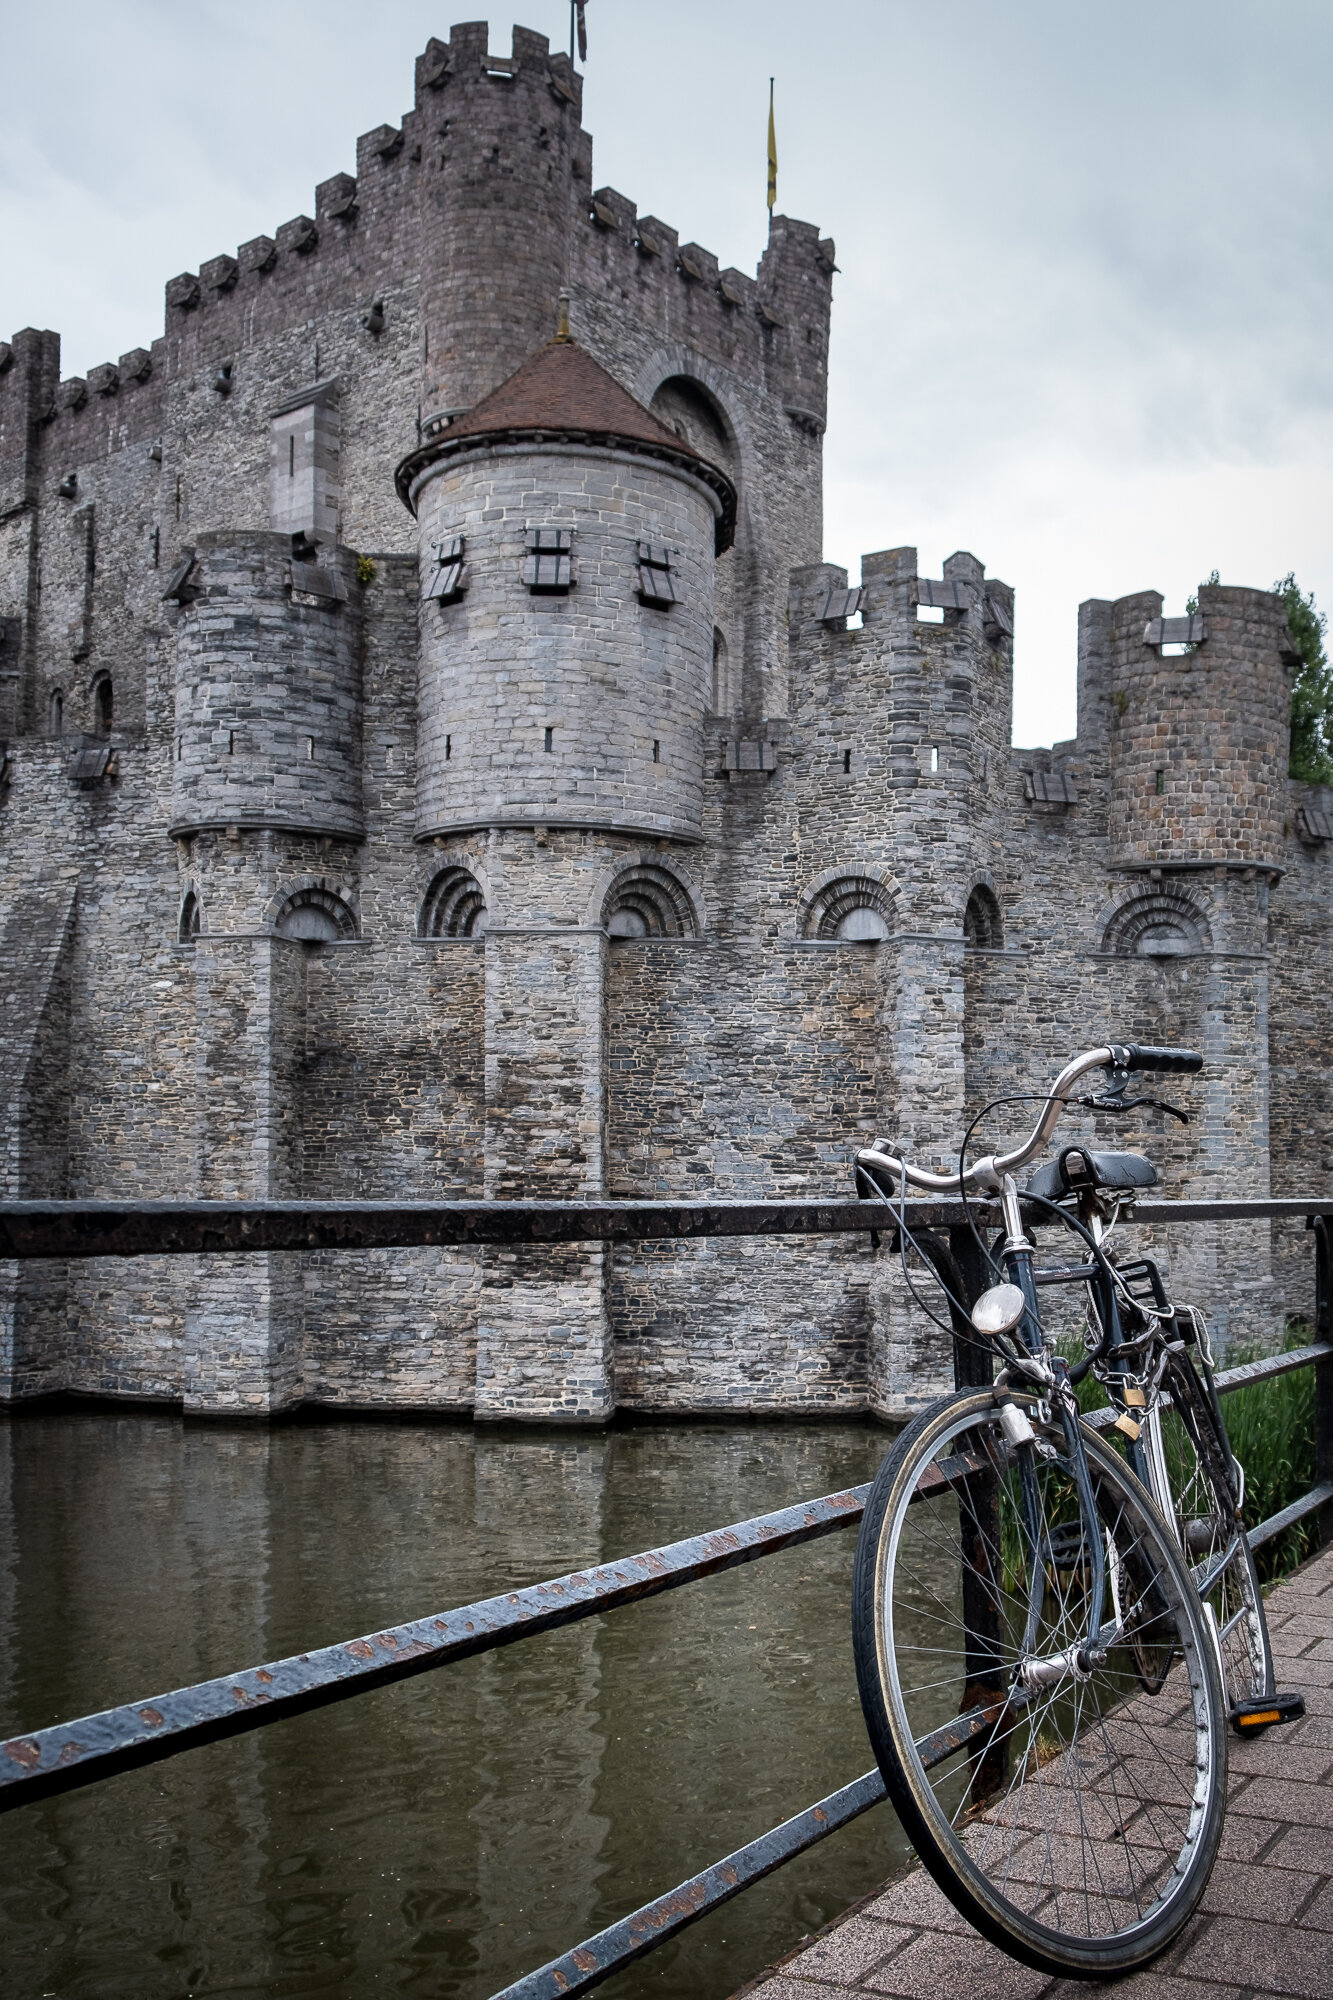 A bike in front of the Gravensteen Castle